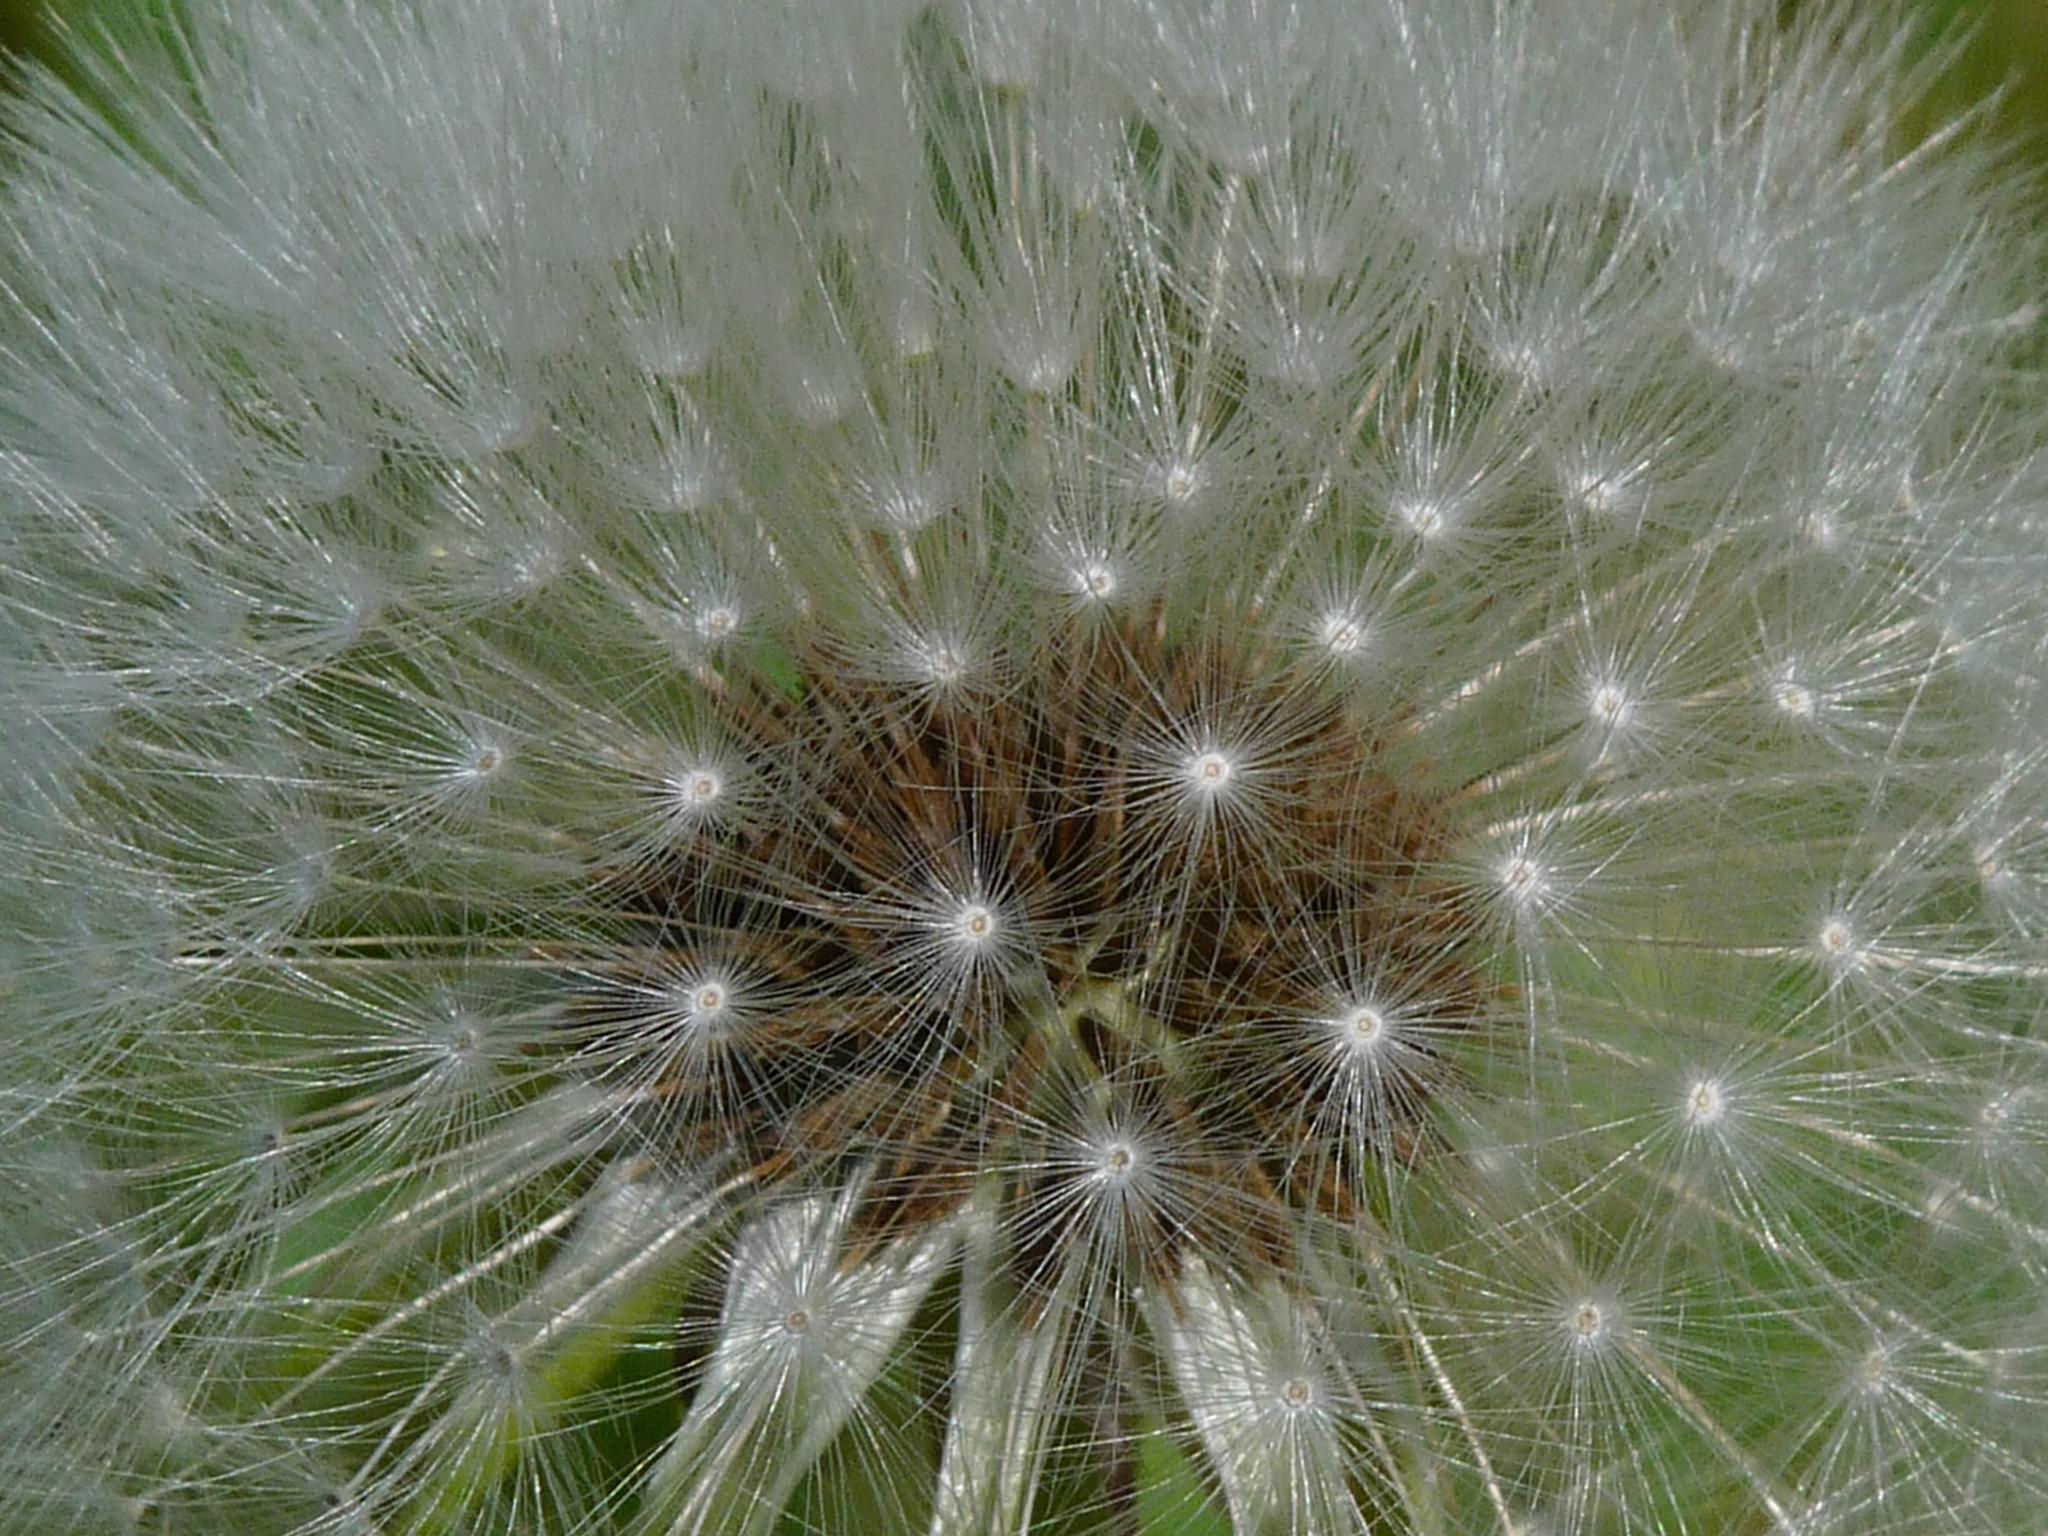 dandelion seeds by theodore.deprey